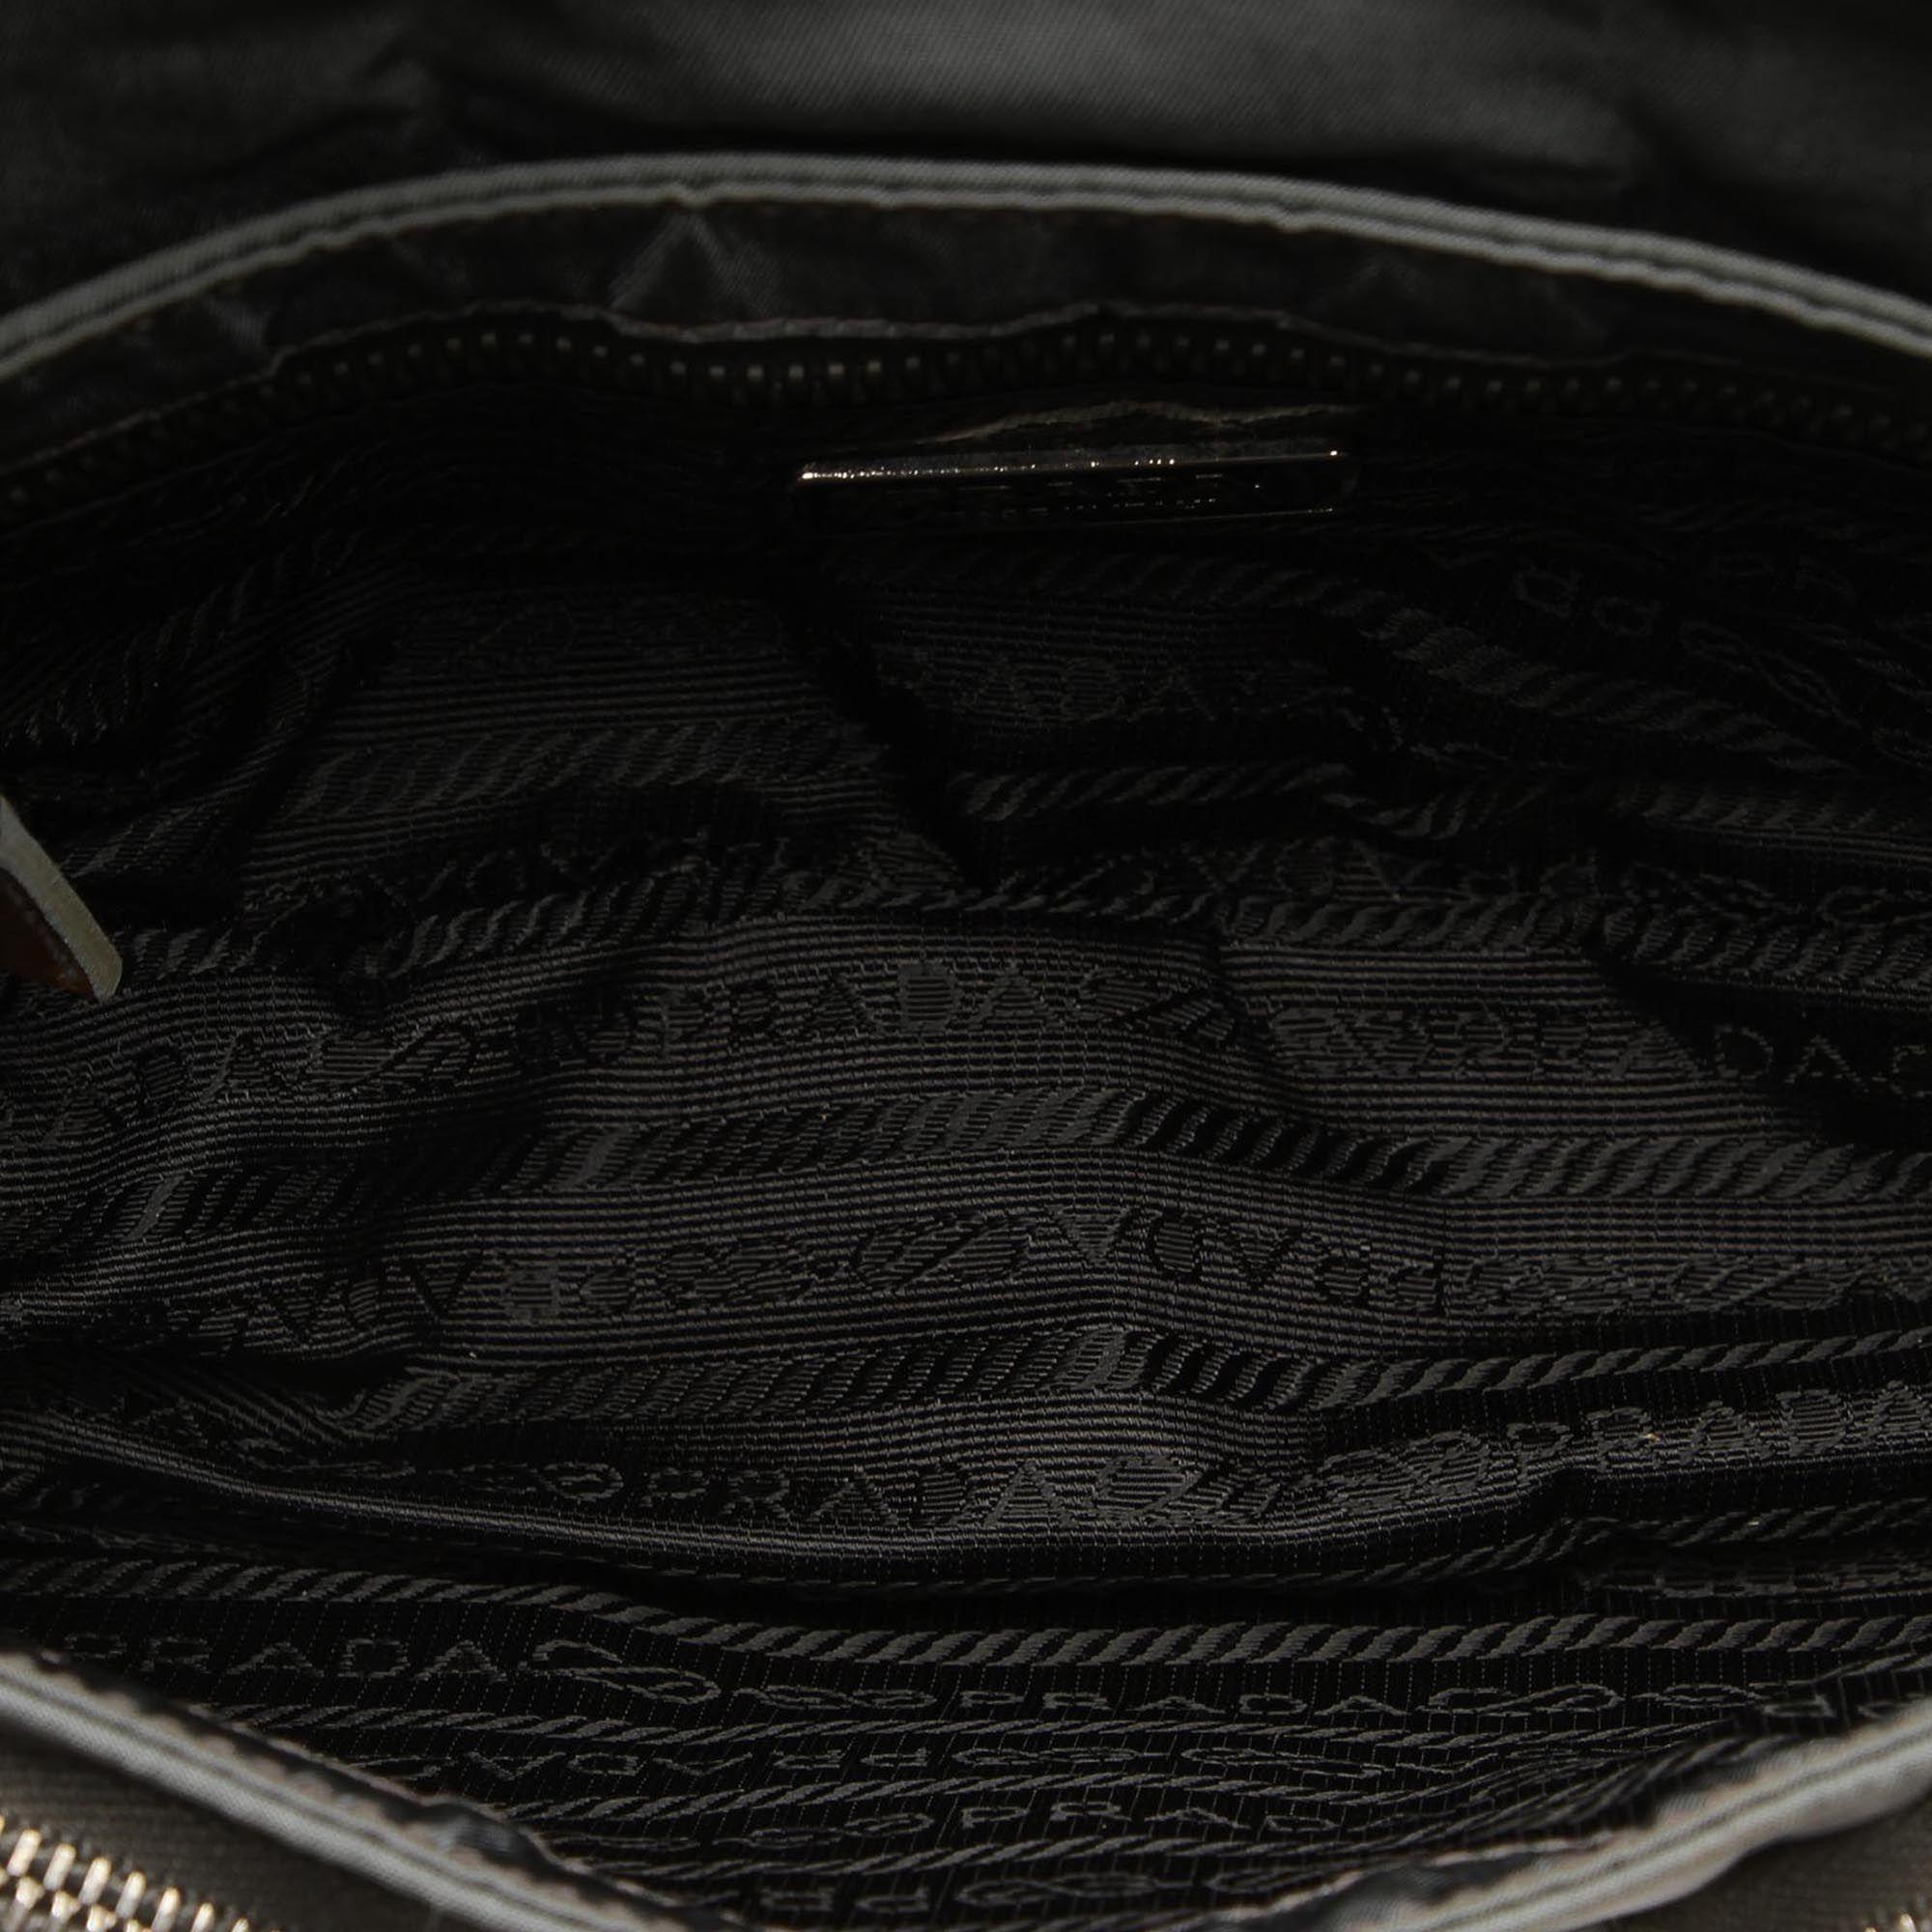 Vintage Prada Nylon Baguette Black